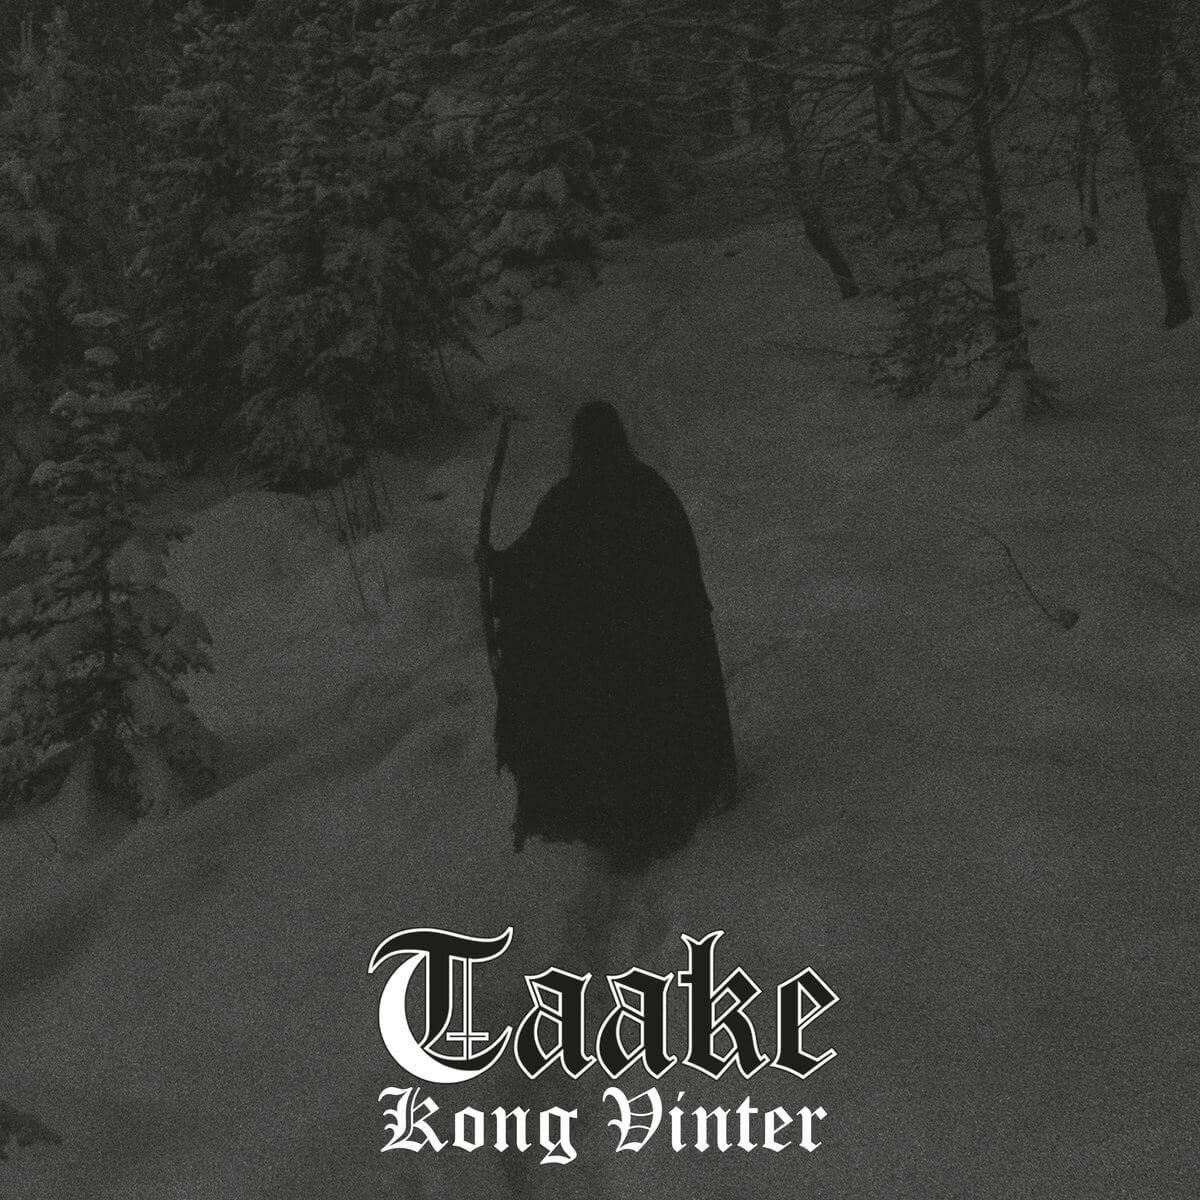 Taake - Kong Vinter